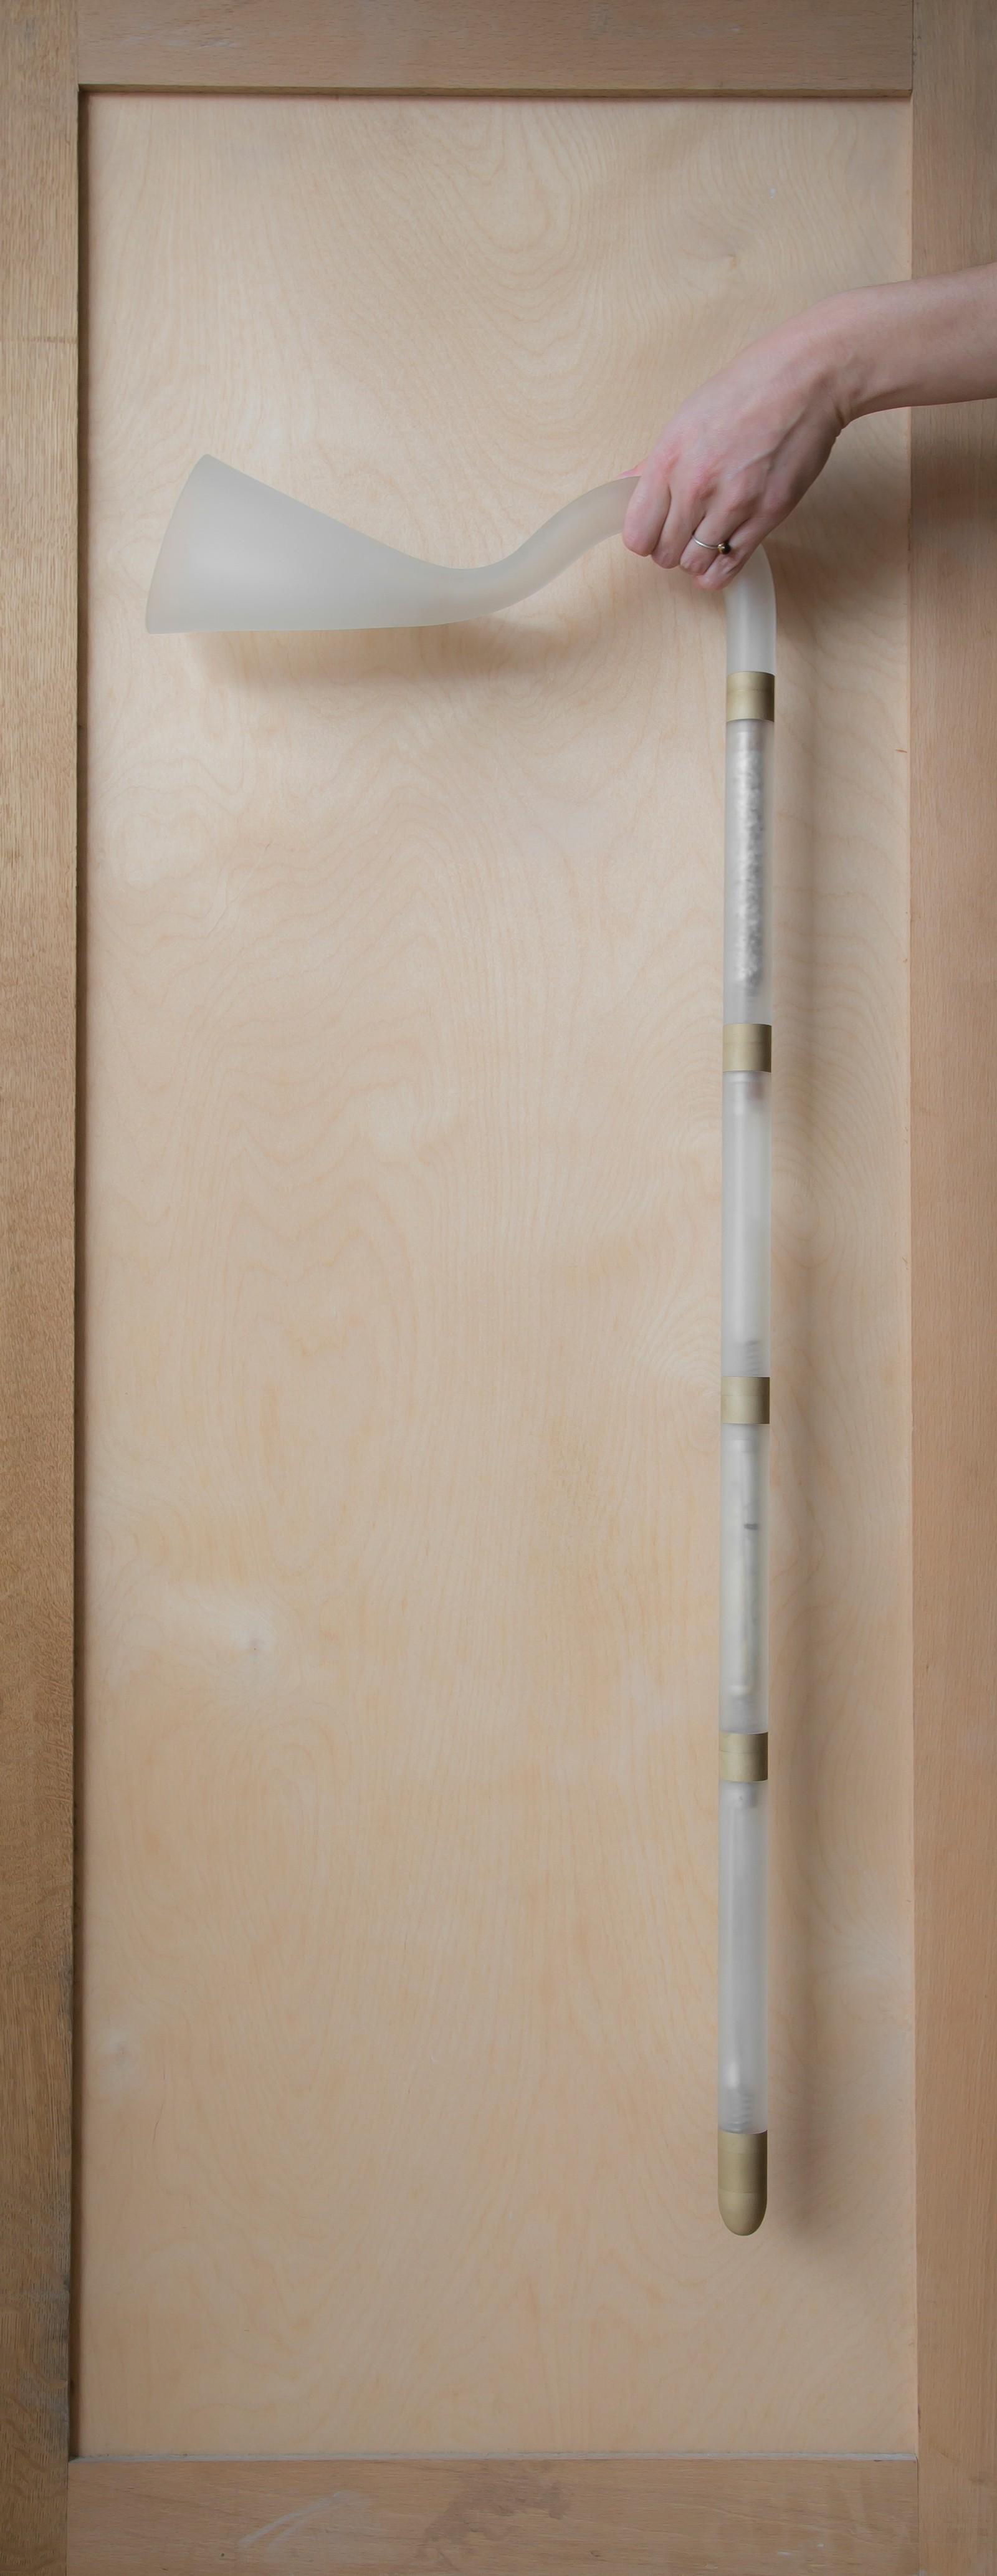 6. NASCO-STO mounted cane5 clean ©Maurizio_Montalti_Officina Corpuscoli